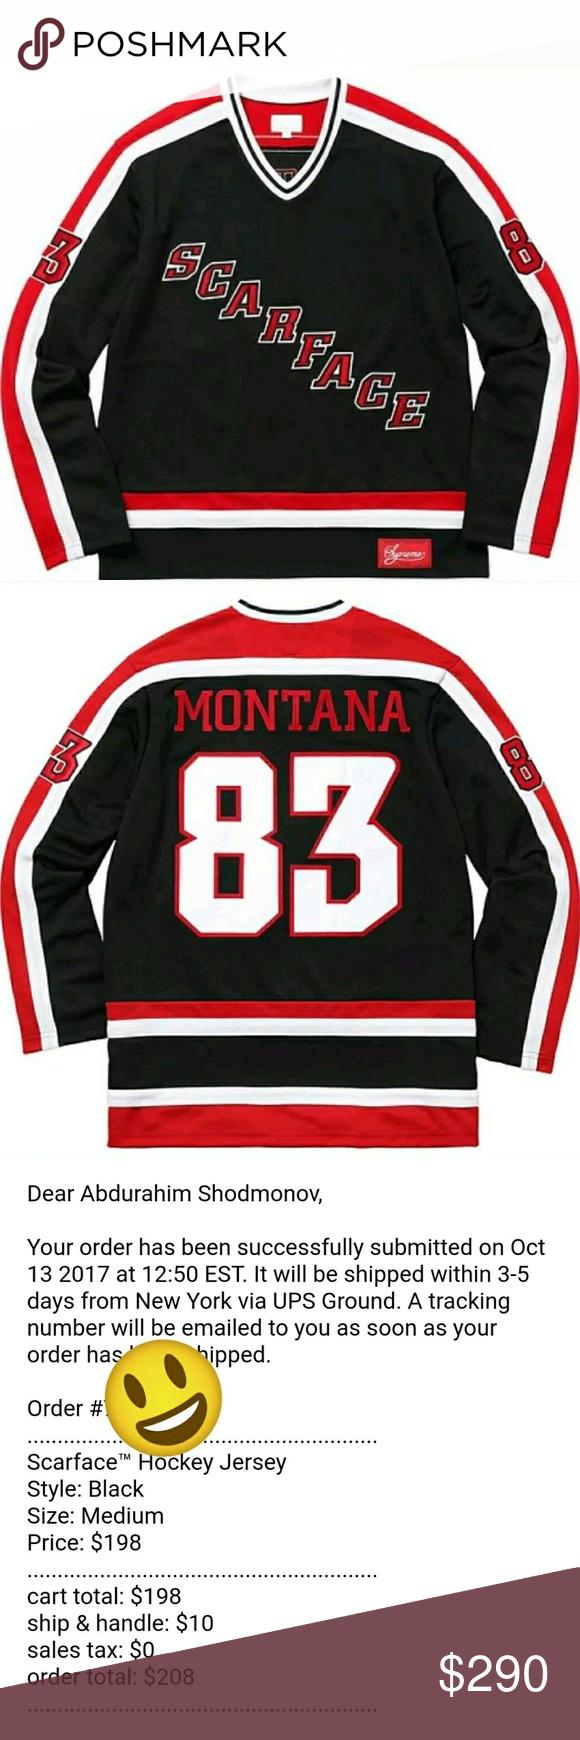 98c7e1f8870b Supreme Scarface Hockey Jersey medium Brand new in hand Supreme Scarface  Hockey Jersey Black Red Size Medium, Confirmed! Supreme Sweaters Cardigan